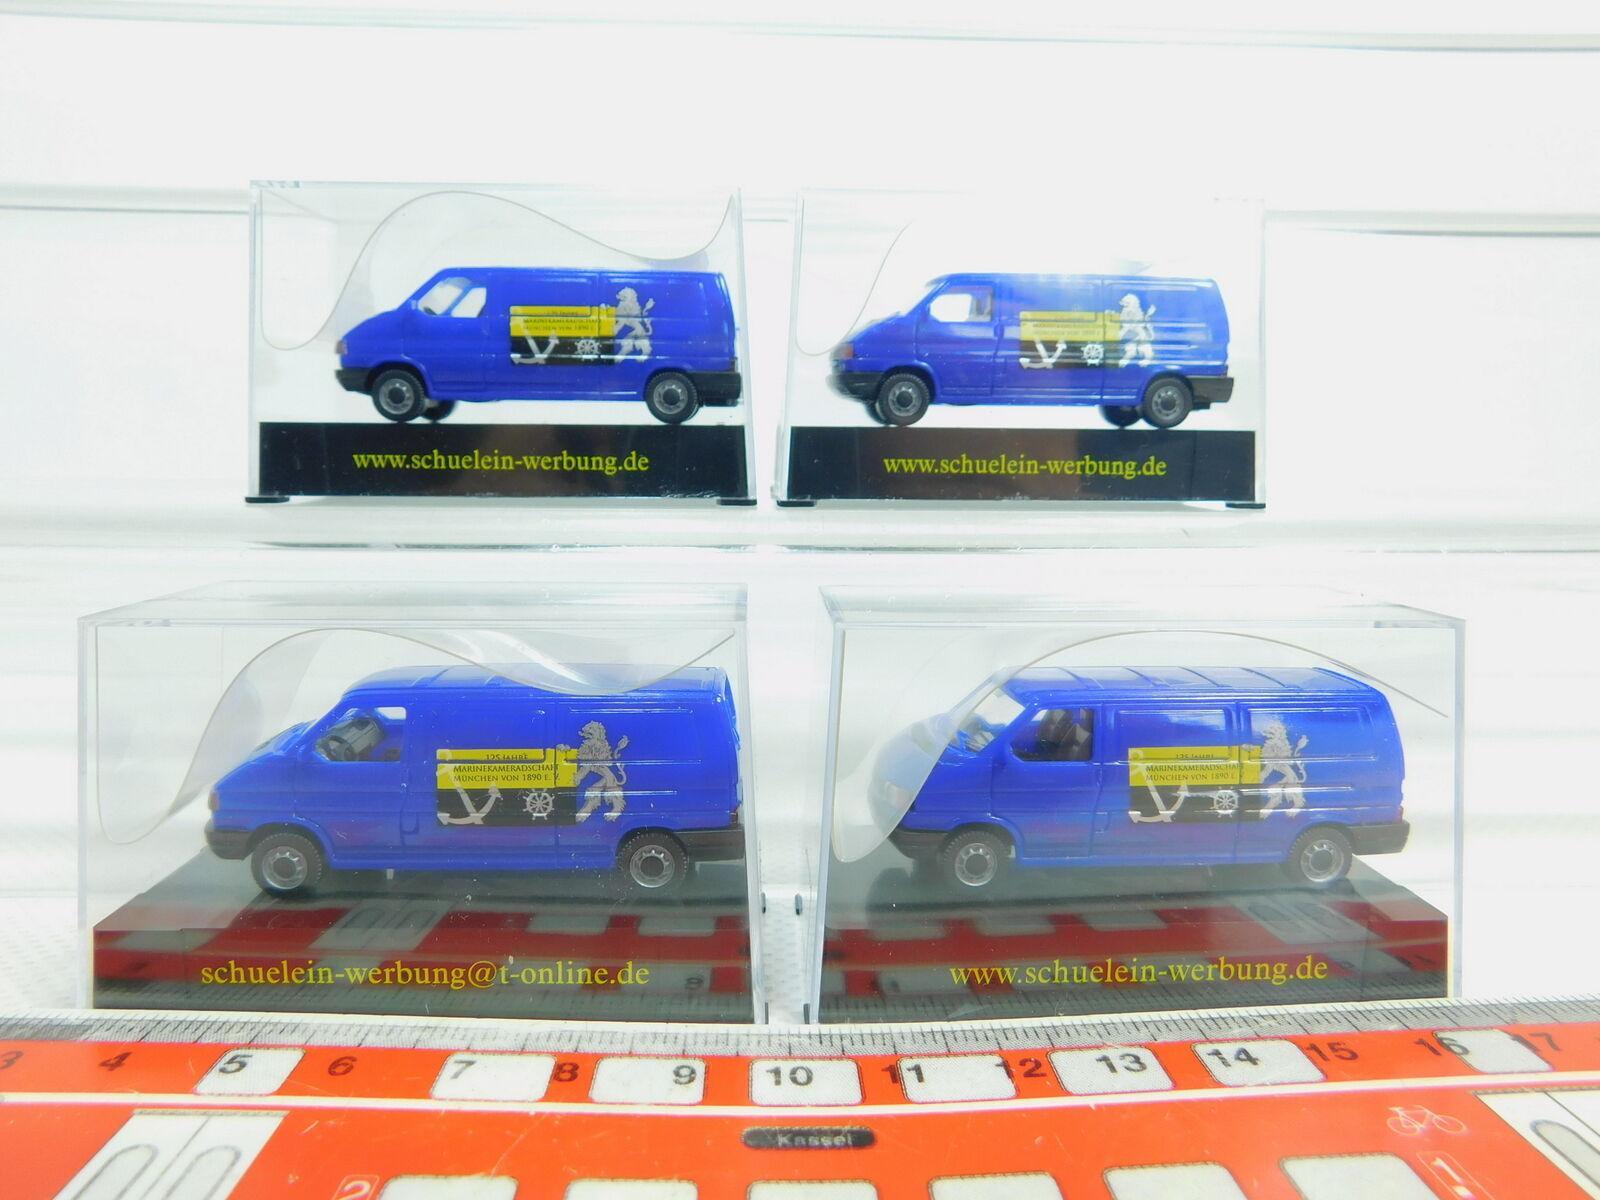 BN131-0, 5 x AWM  ( Amw ) H0   1 87 Transporter VW Marinekameradschaft, Nip